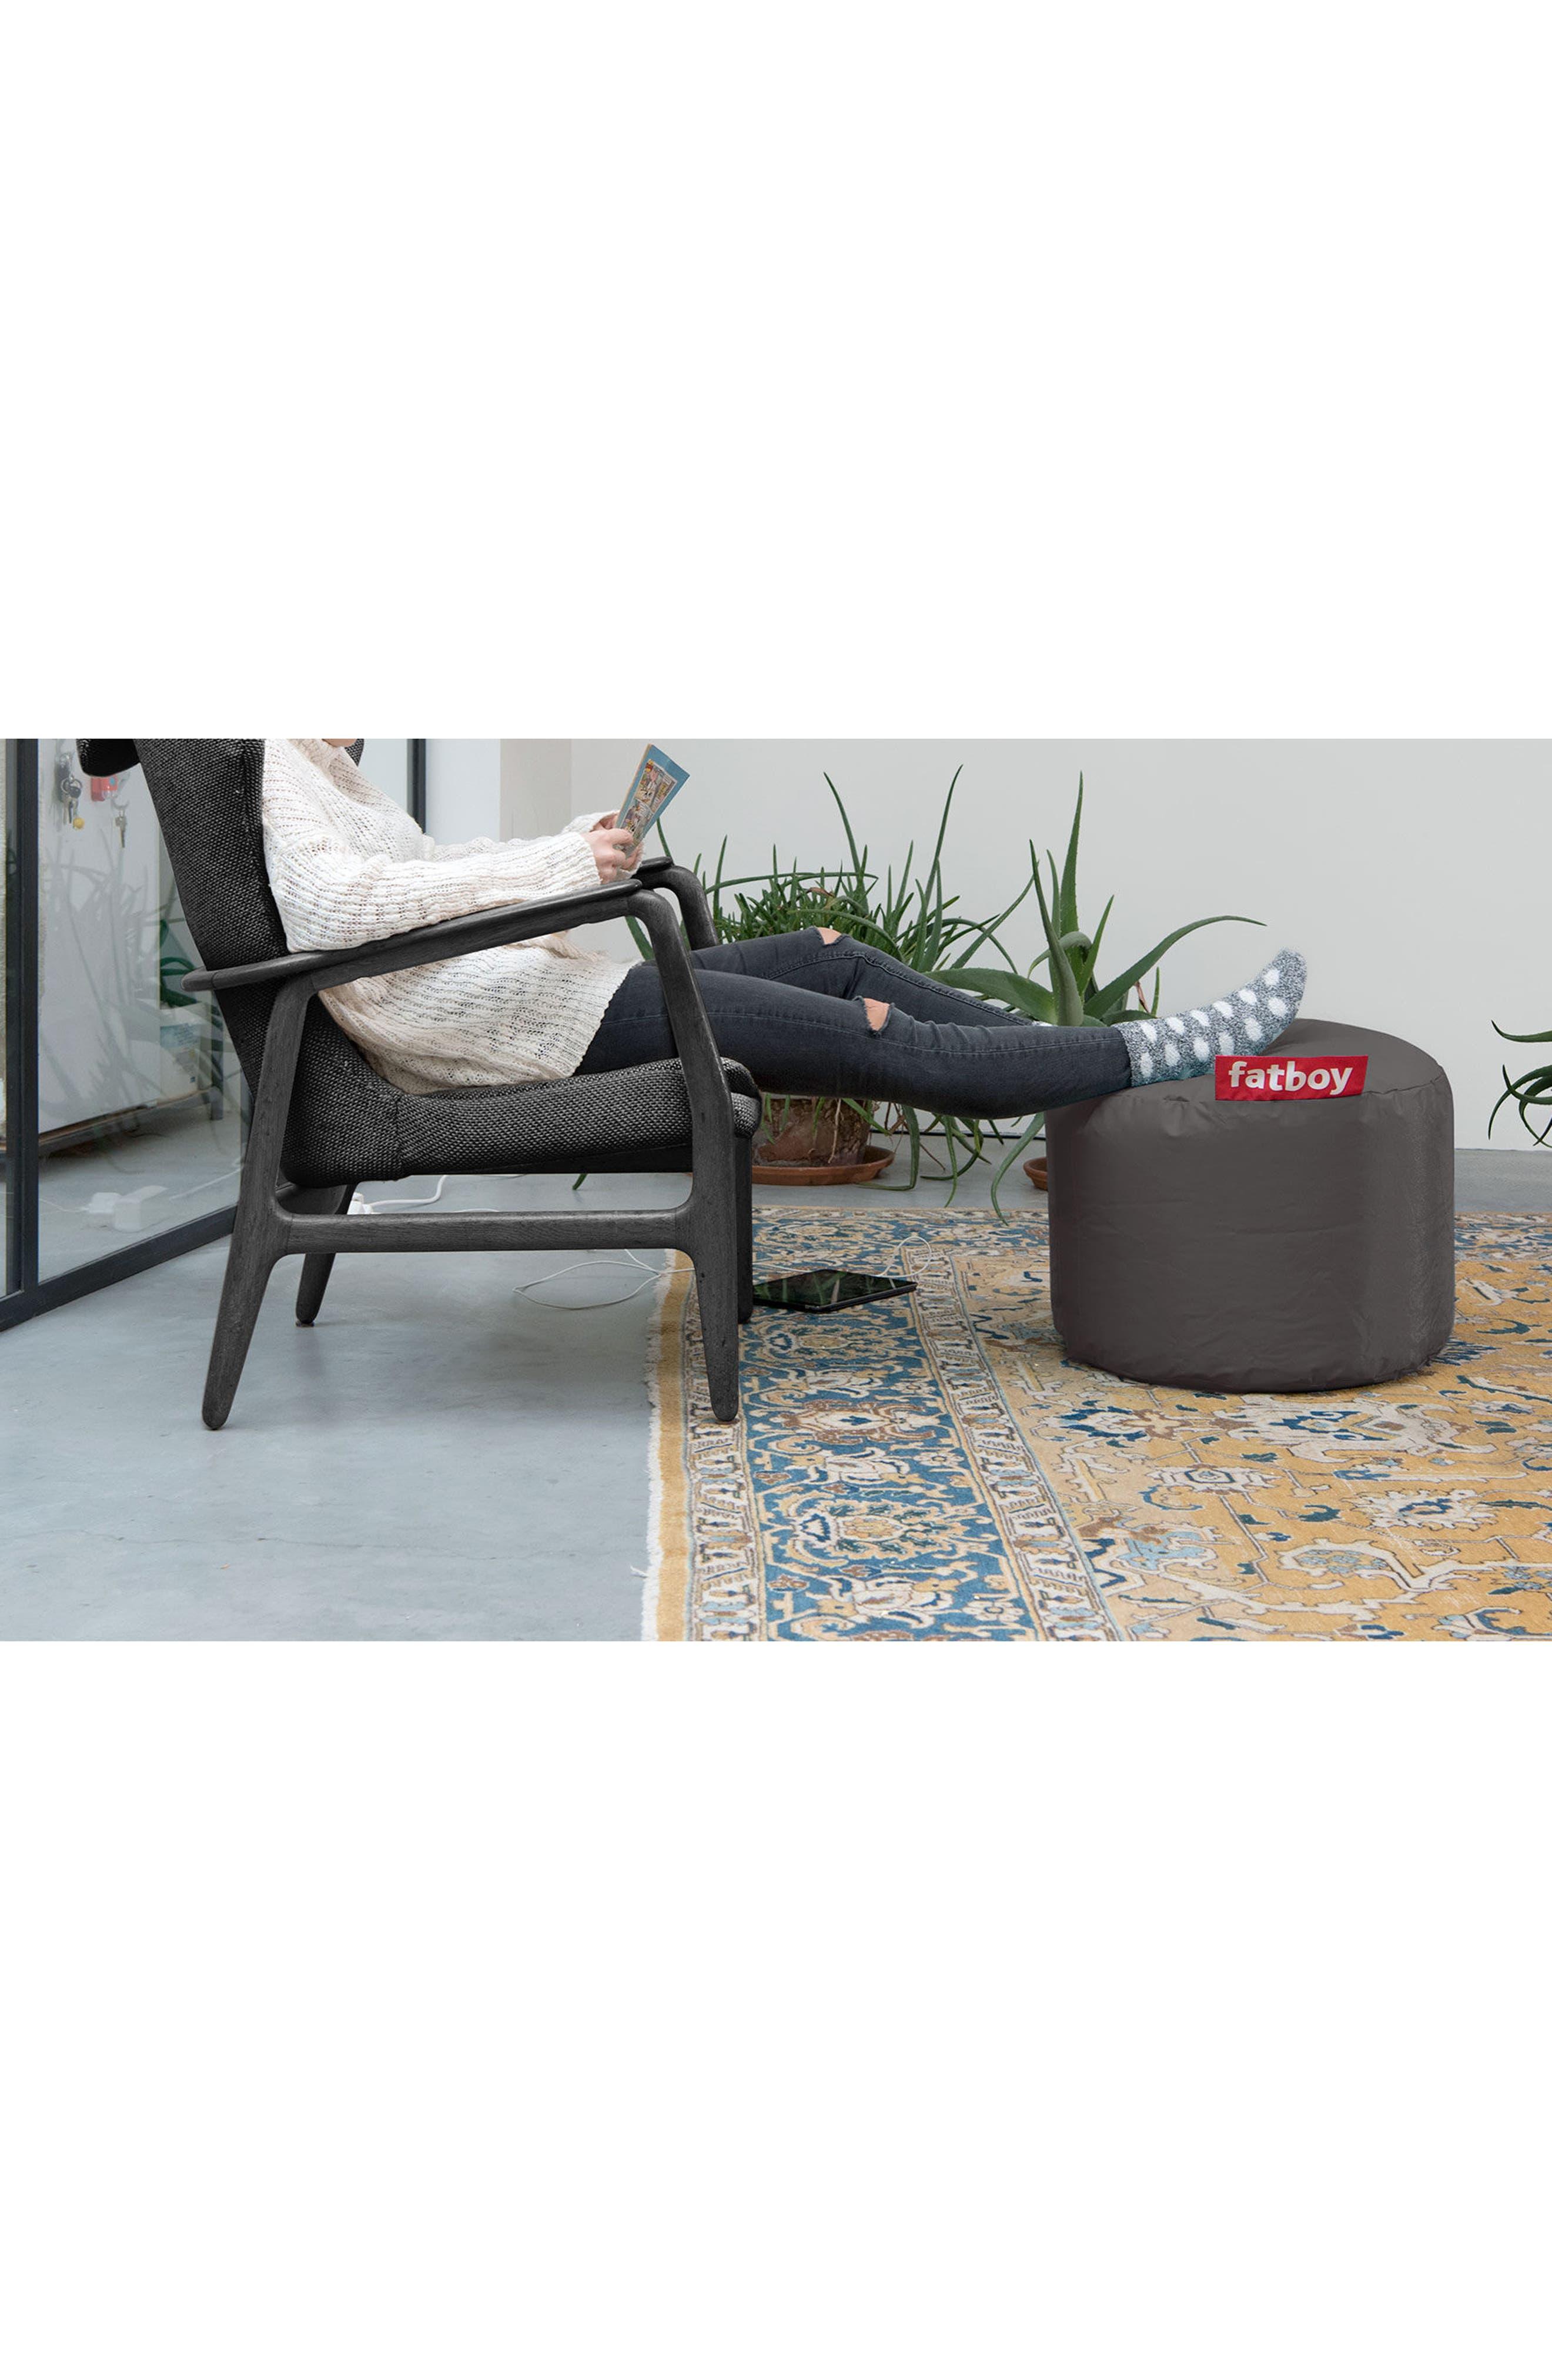 the lawyer river online products furniture original desert lamzac fatboy shop